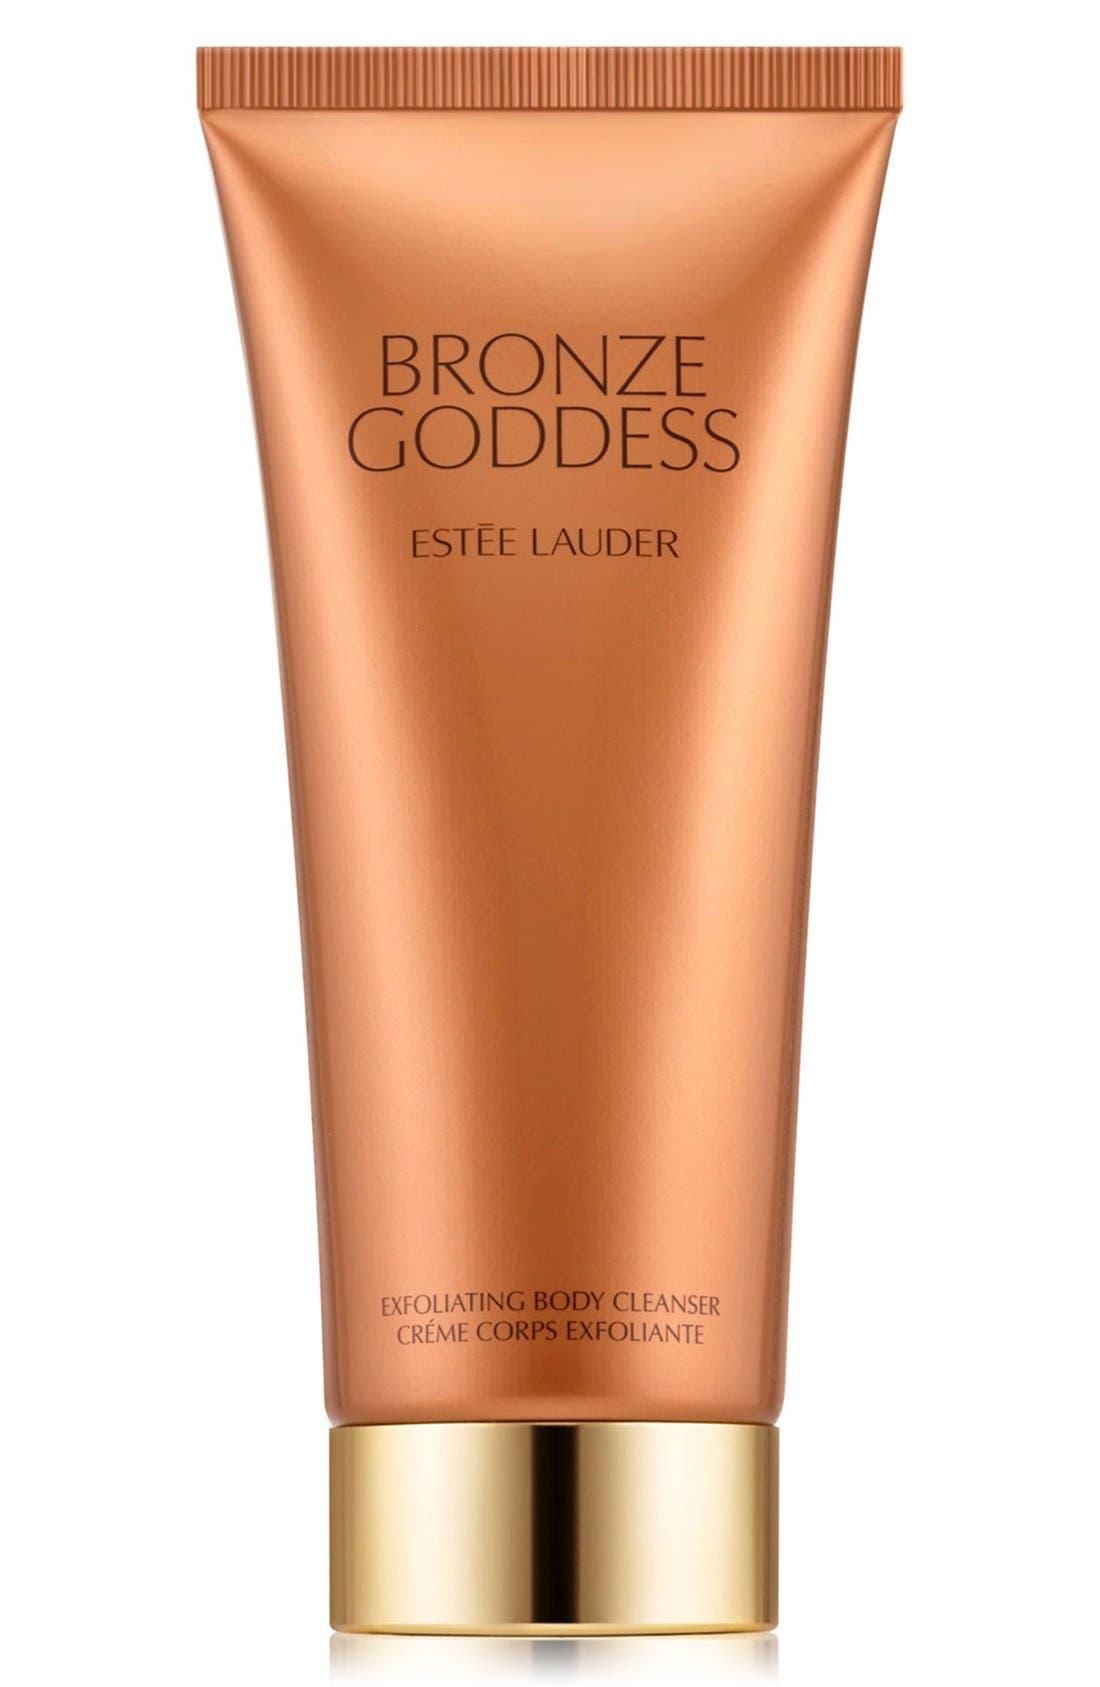 Estée Lauder Bronze Goddess Exfoliating Body Cleanser